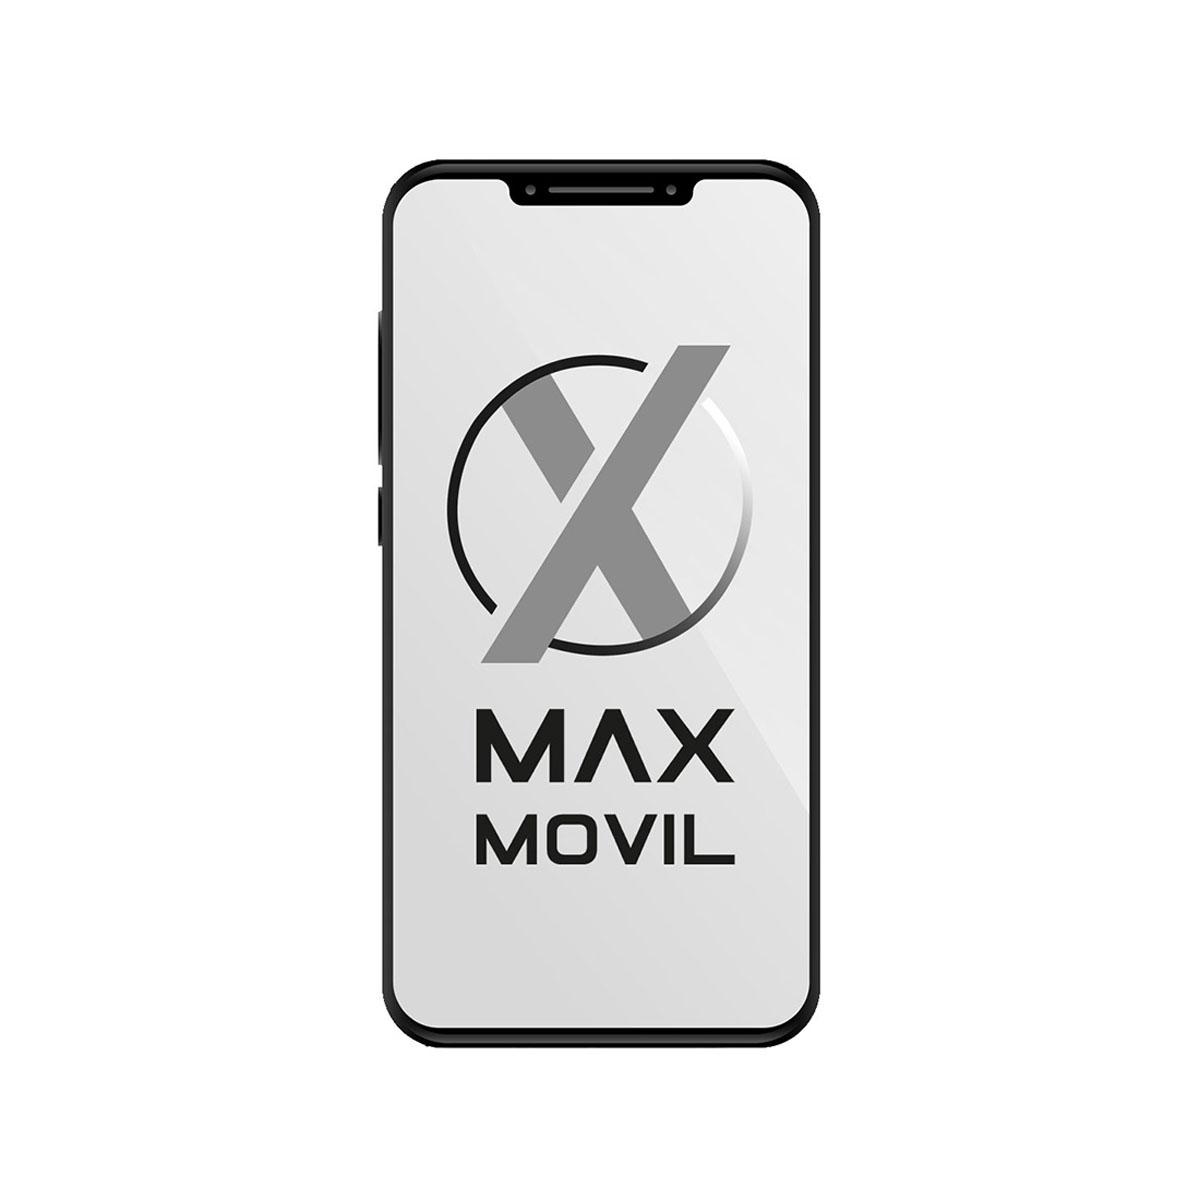 Kit de batería extra Samsung EB-H1J9VNE para Galaxy Note 2